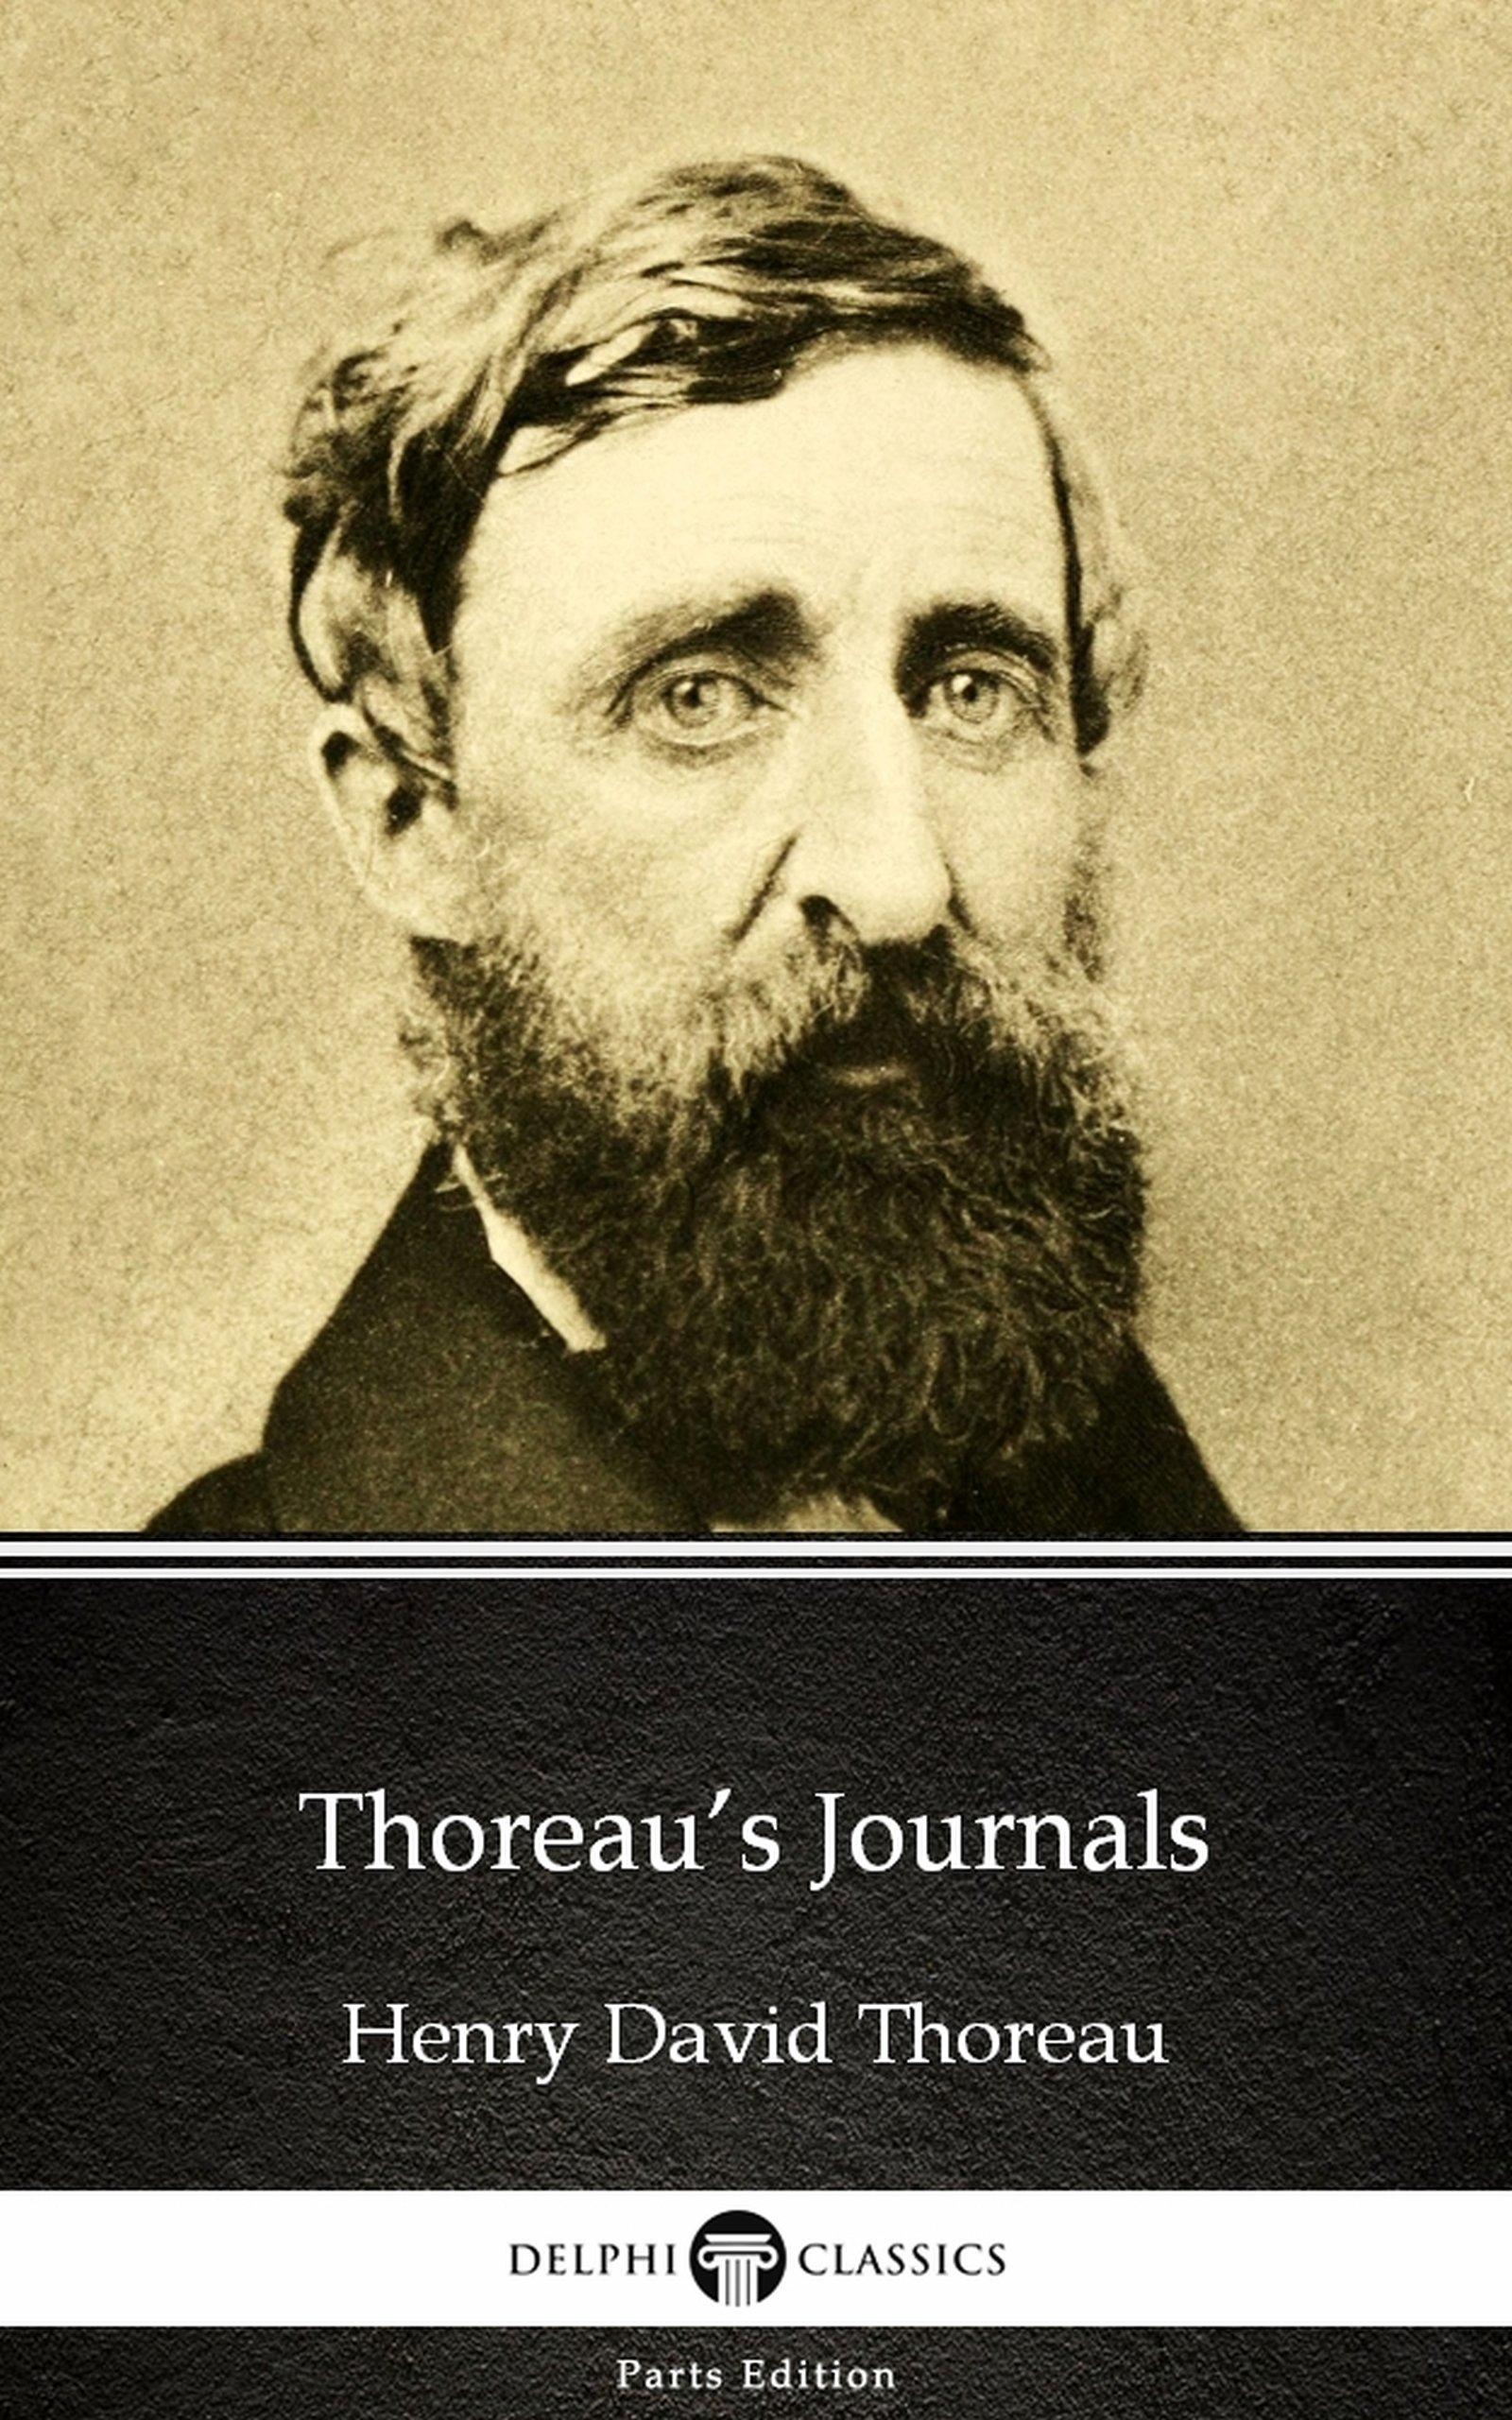 Thoreau's Journals by Henry David Thoreau - Delphi Classics (Annotated) (Delphi Parts Edition (Henry David Thoreau) Book 36)